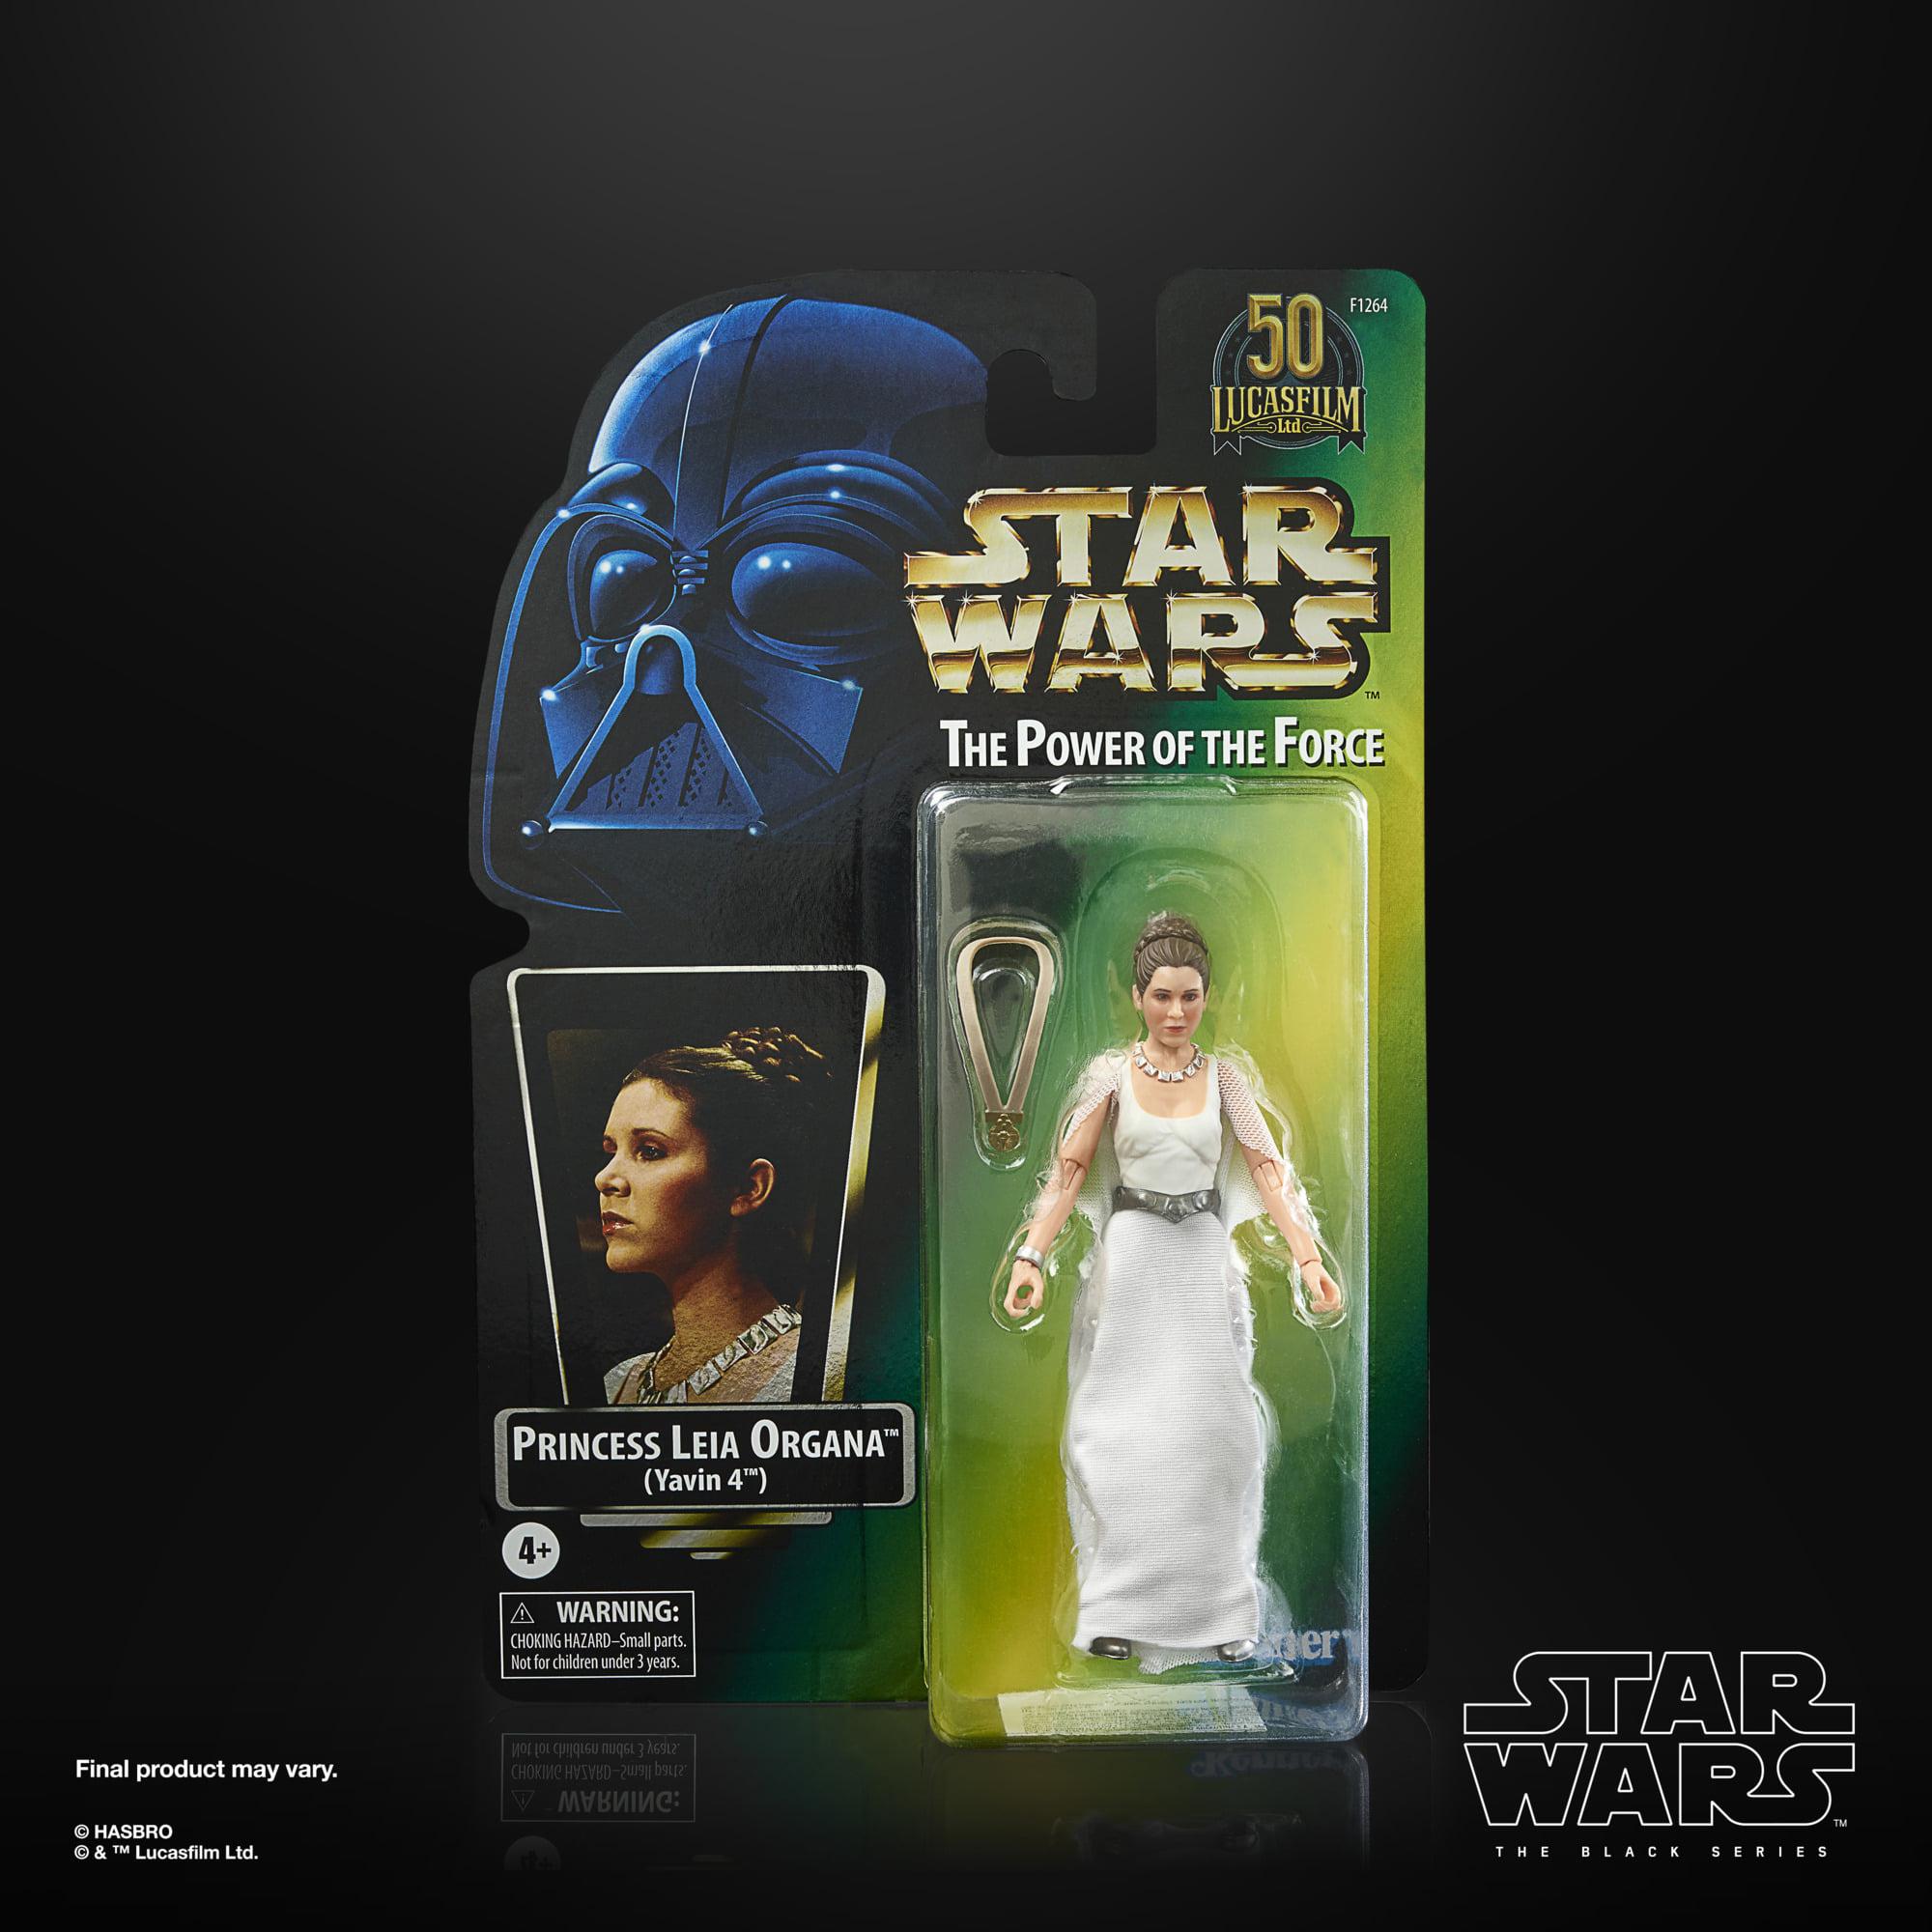 Princess Leia Organa (Yavin 4)